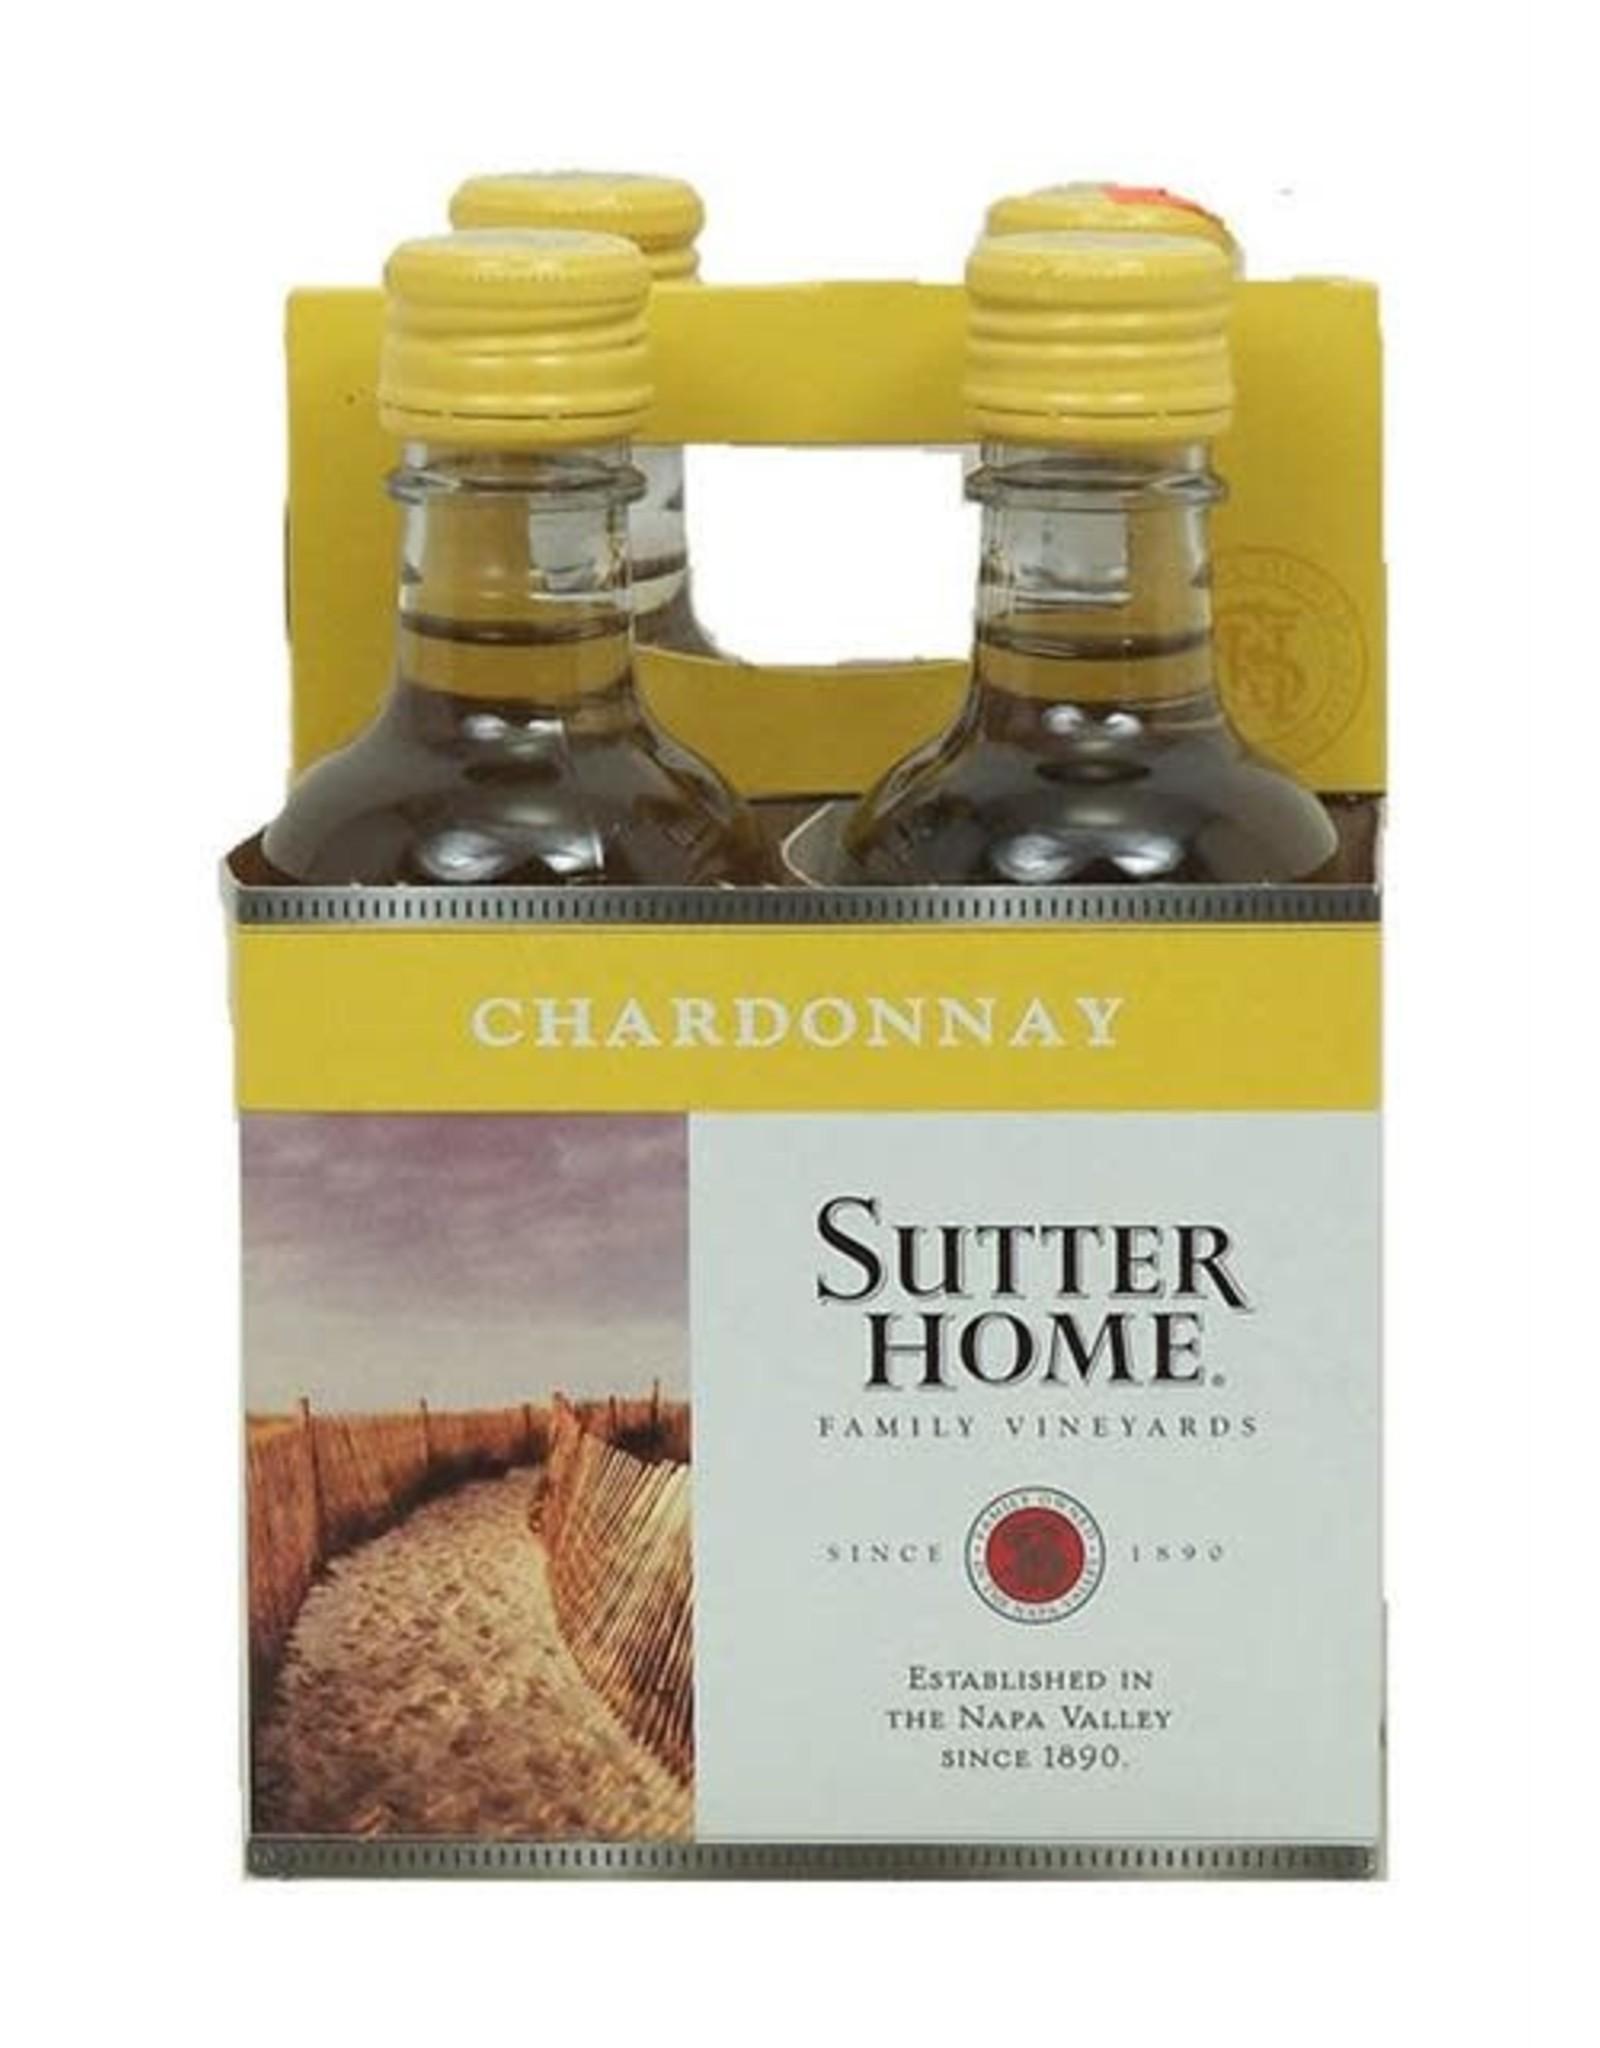 SUTTER HOME CHARDONNAY 4PK